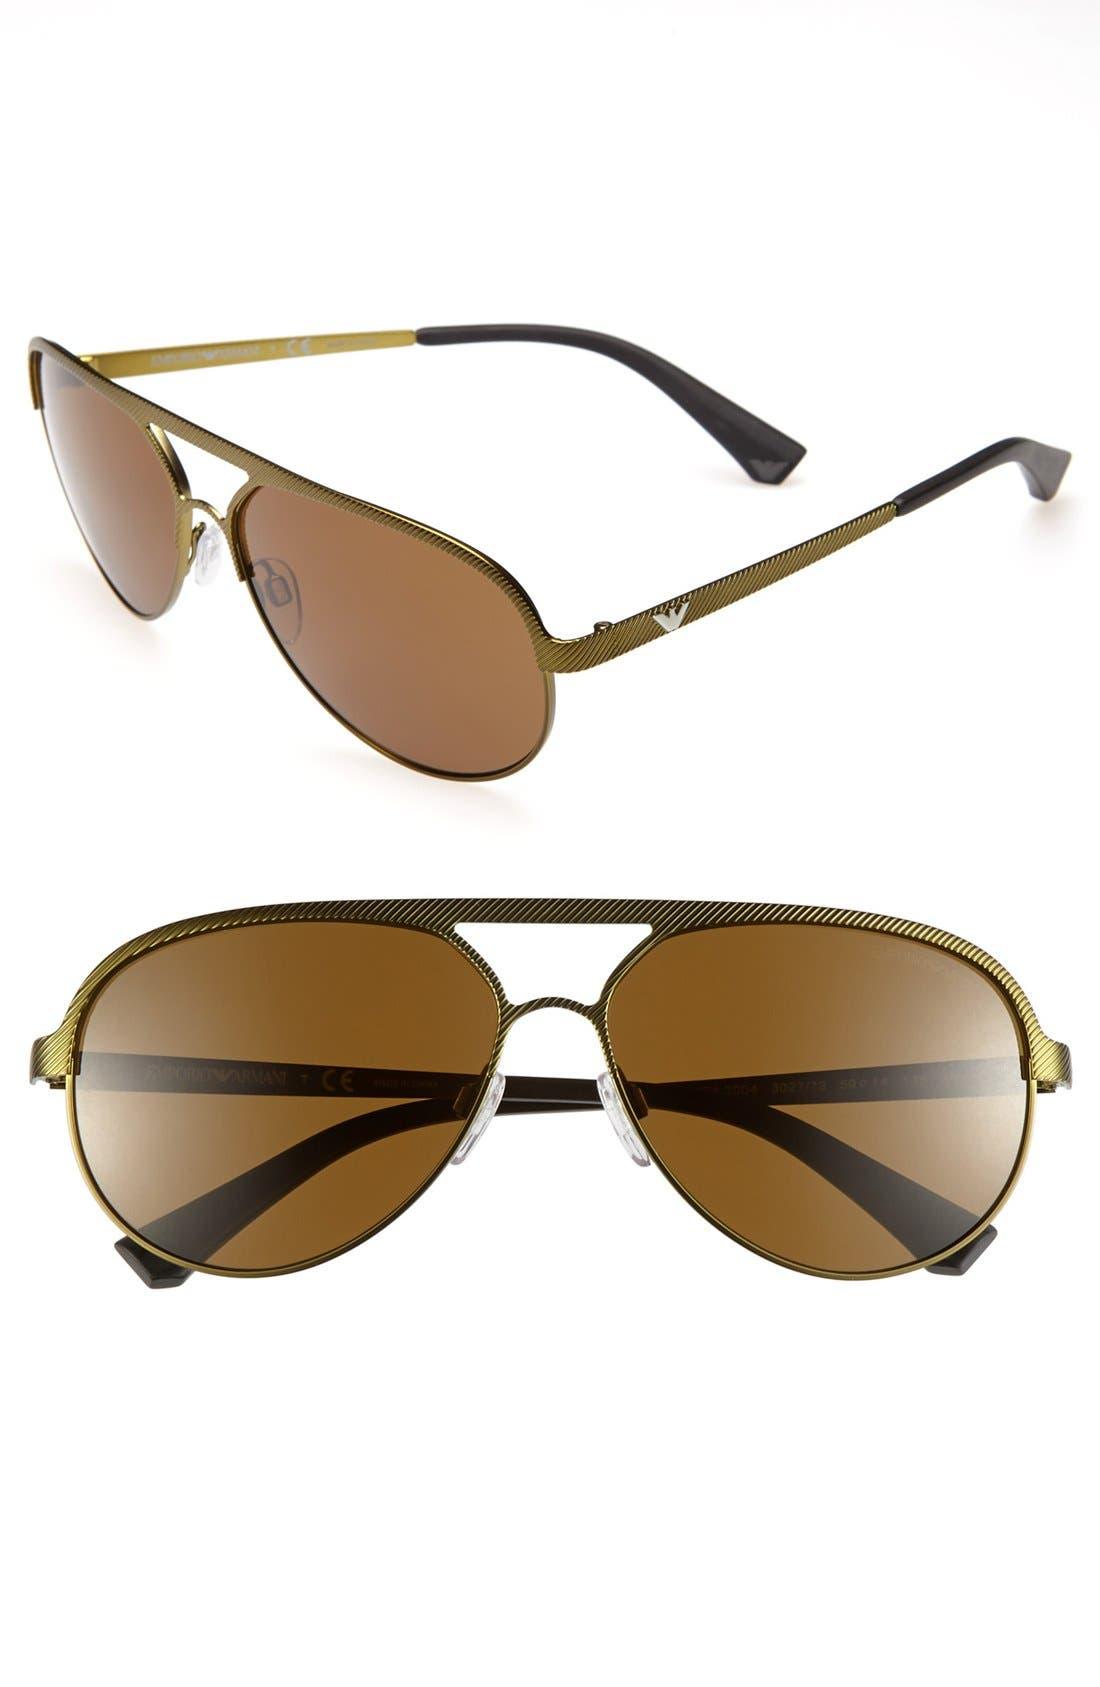 Main Image - Emporio Armani 59mm Aviator Sunglasses